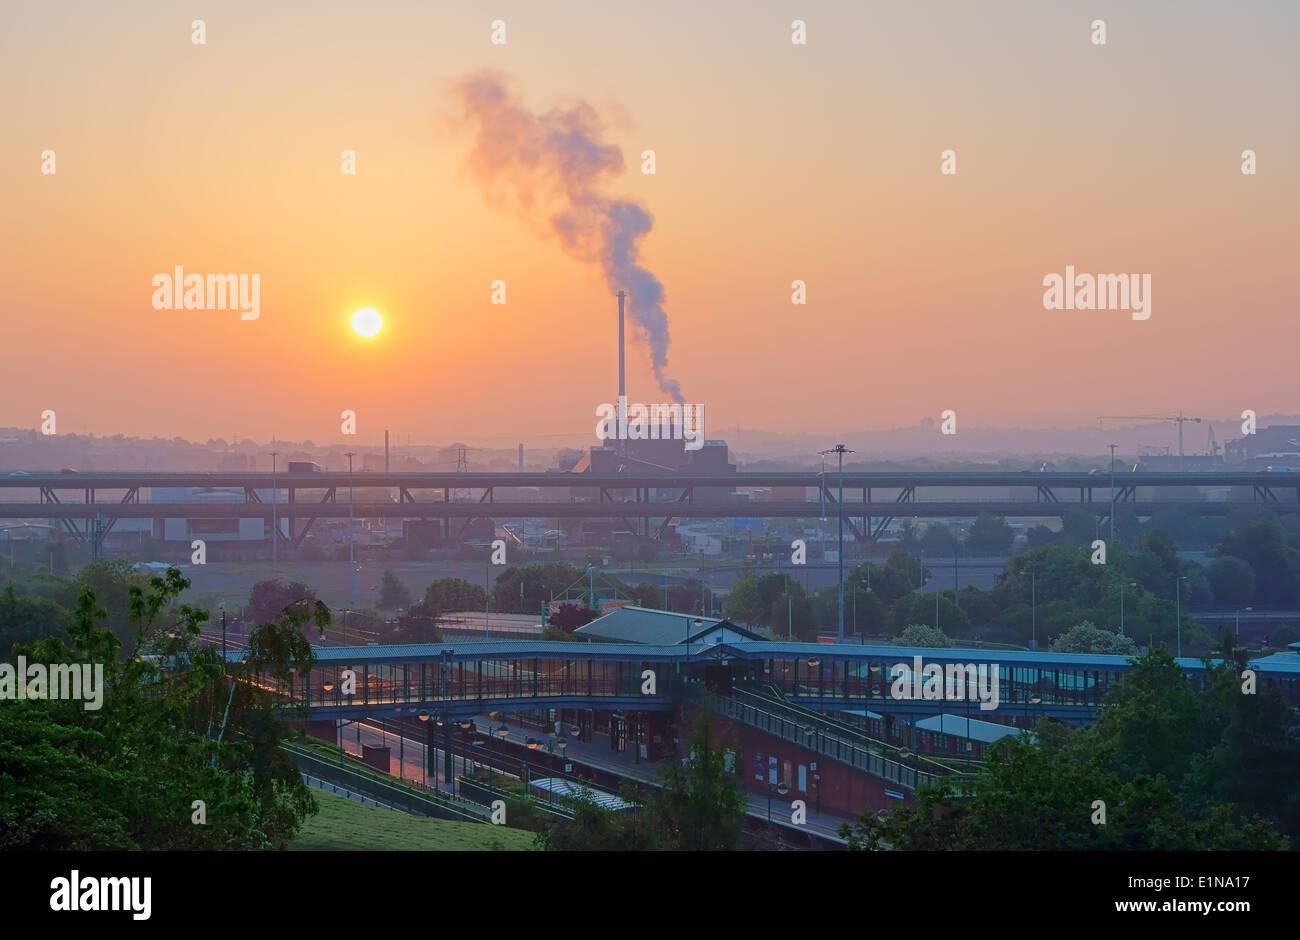 UK,South Yorkshire,Sheffield, Sunrise over Tinsley Viaduct & Blackburn Meadows Biomass Power Station - Stock Image